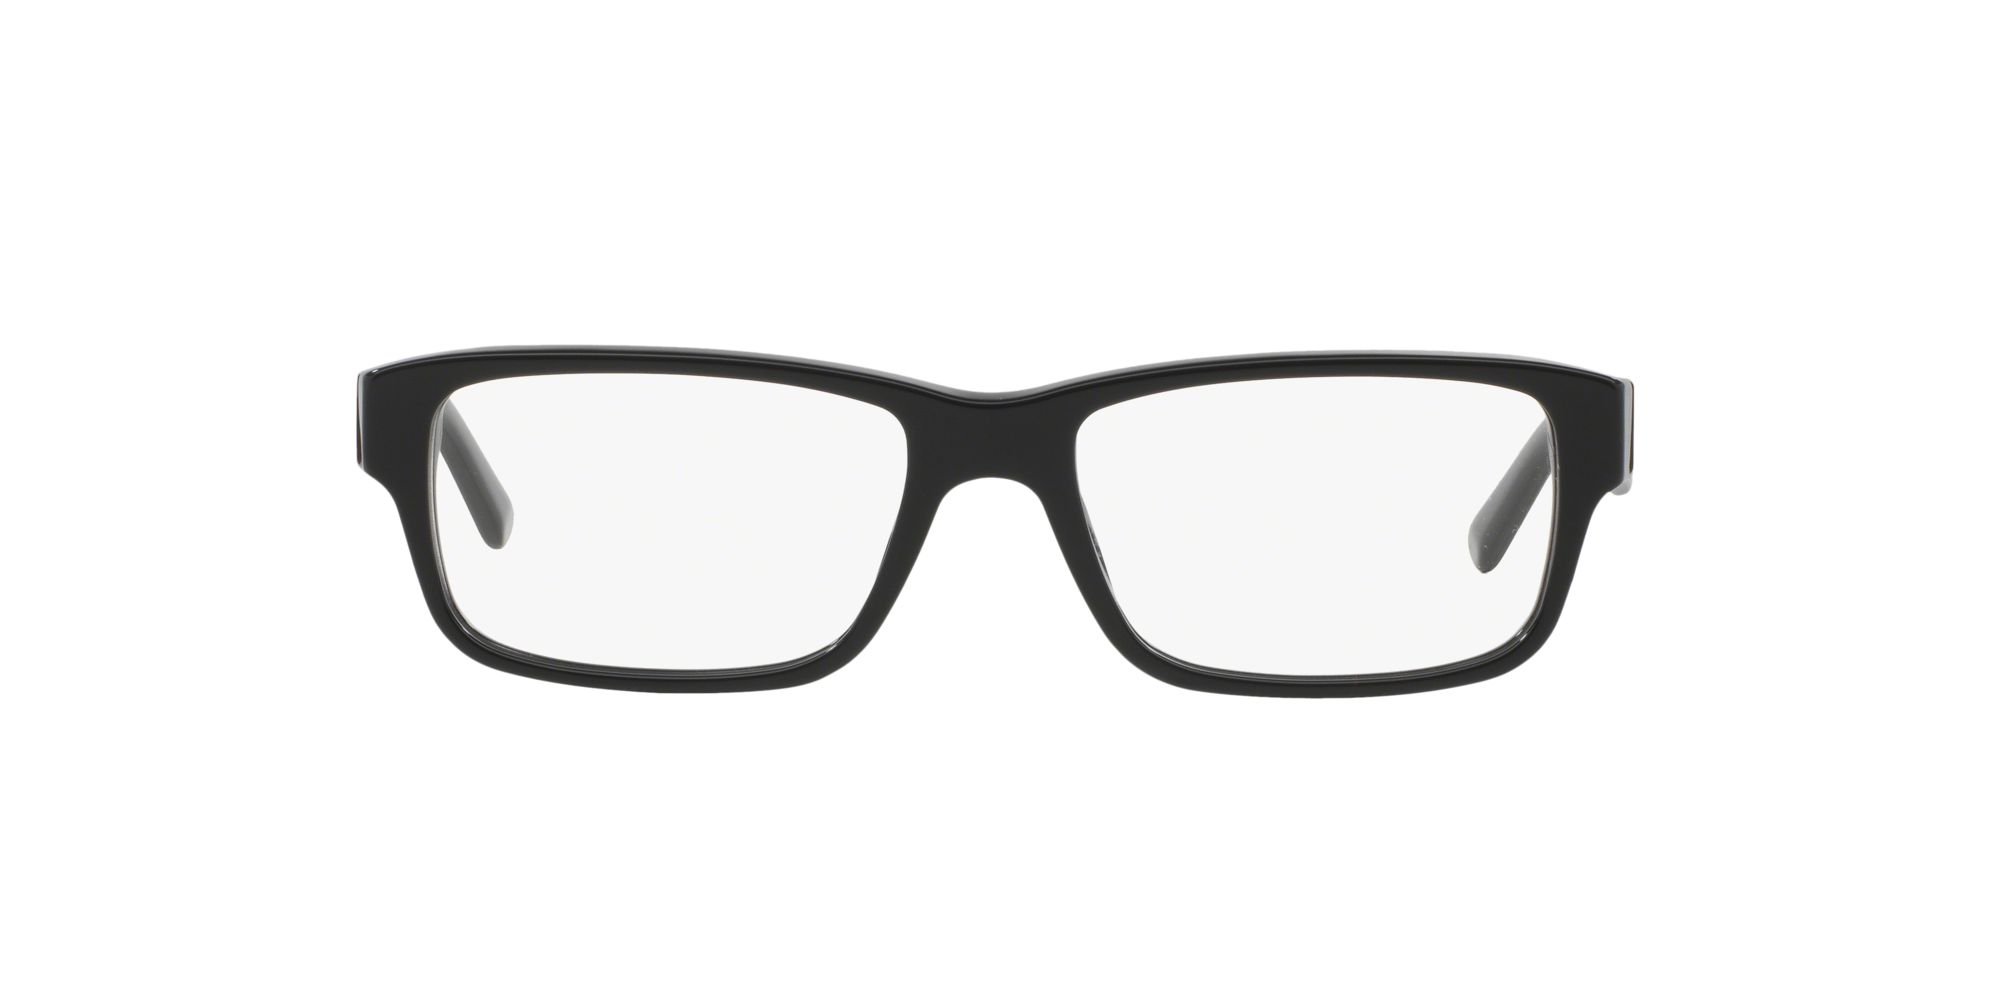 Image for PR16MV from LensCrafters | Glasses, Prescription Glasses Online, Eyewear